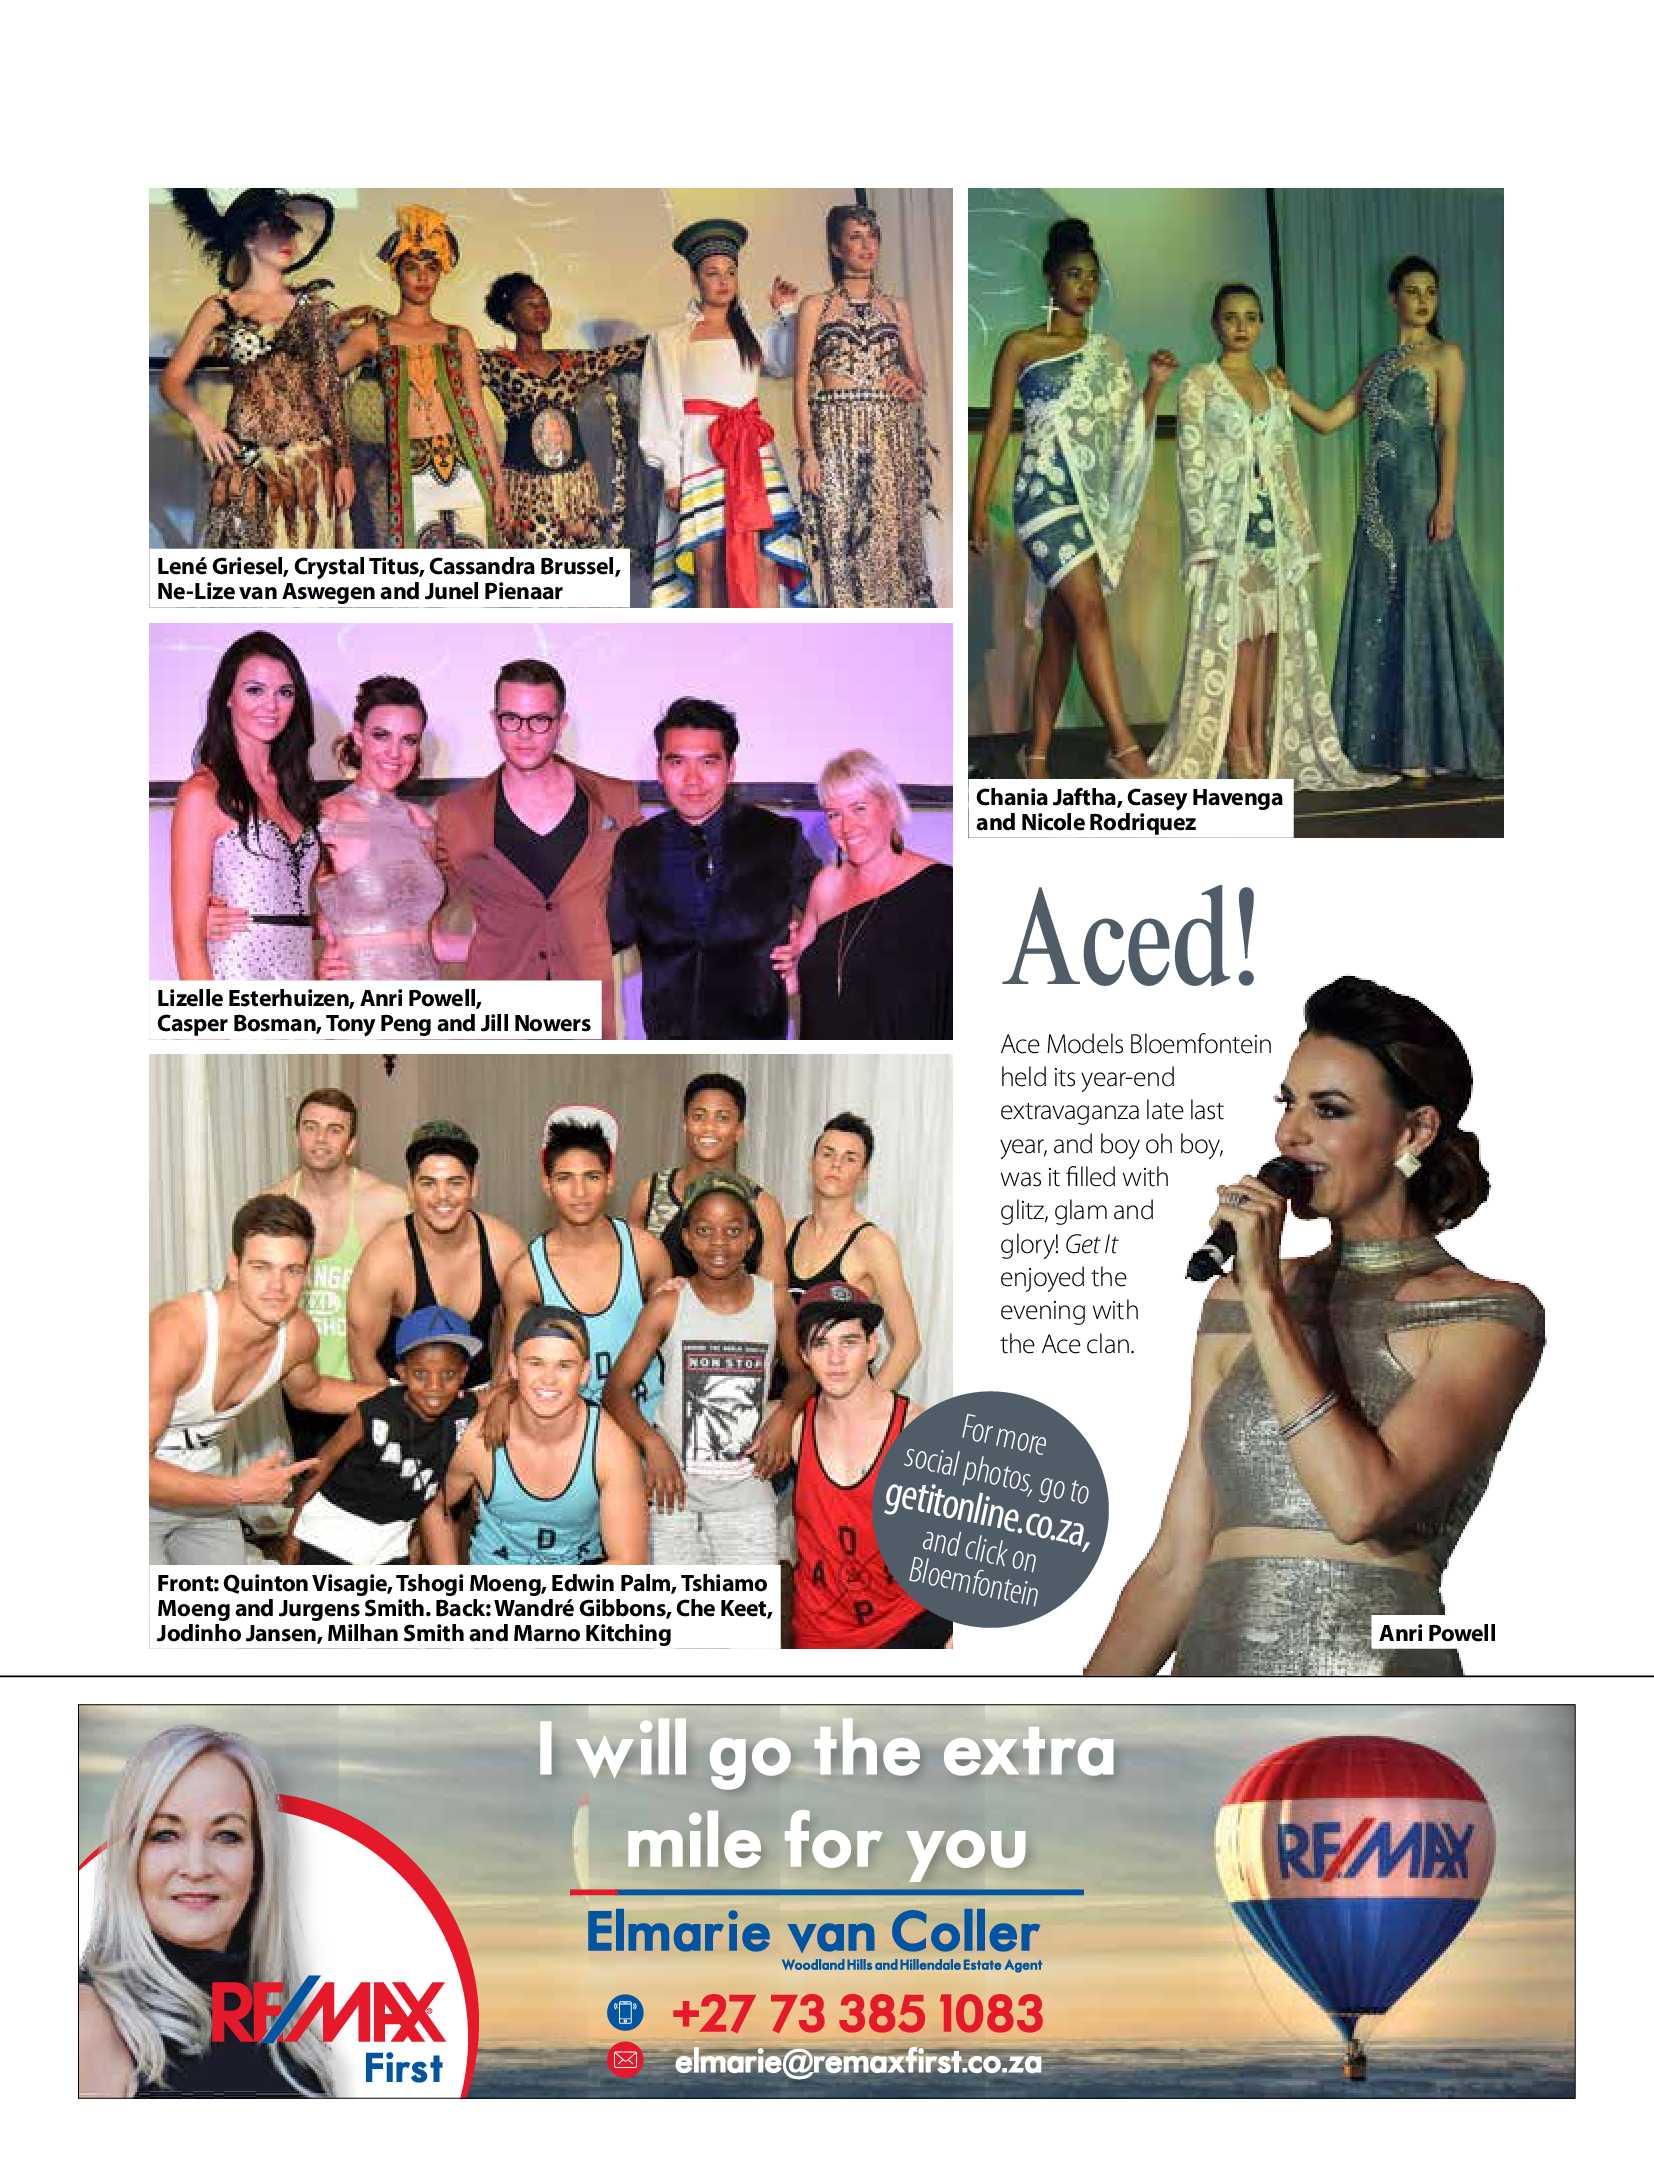 bloemfontein-getit-january-2017-epapers-page-10